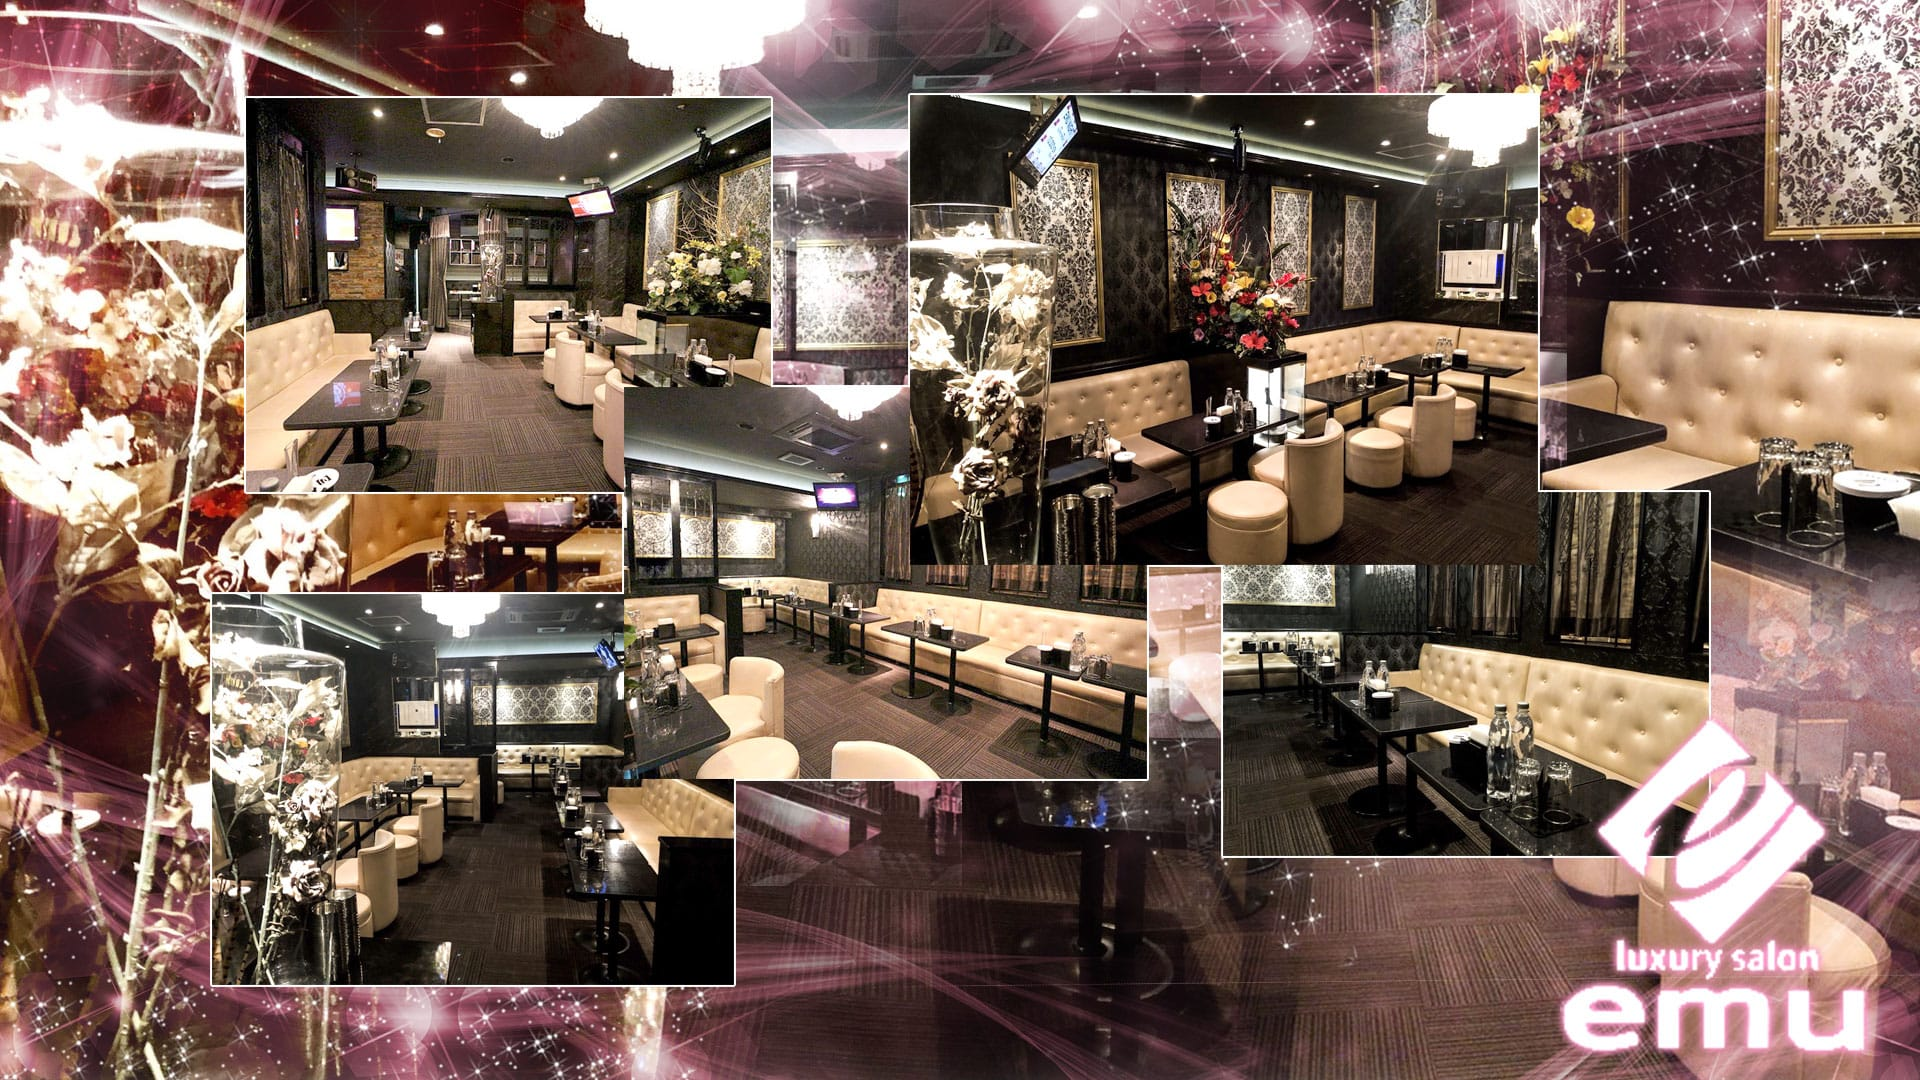 Luxury salon emu(エミュー) 蒲田キャバクラ TOP画像